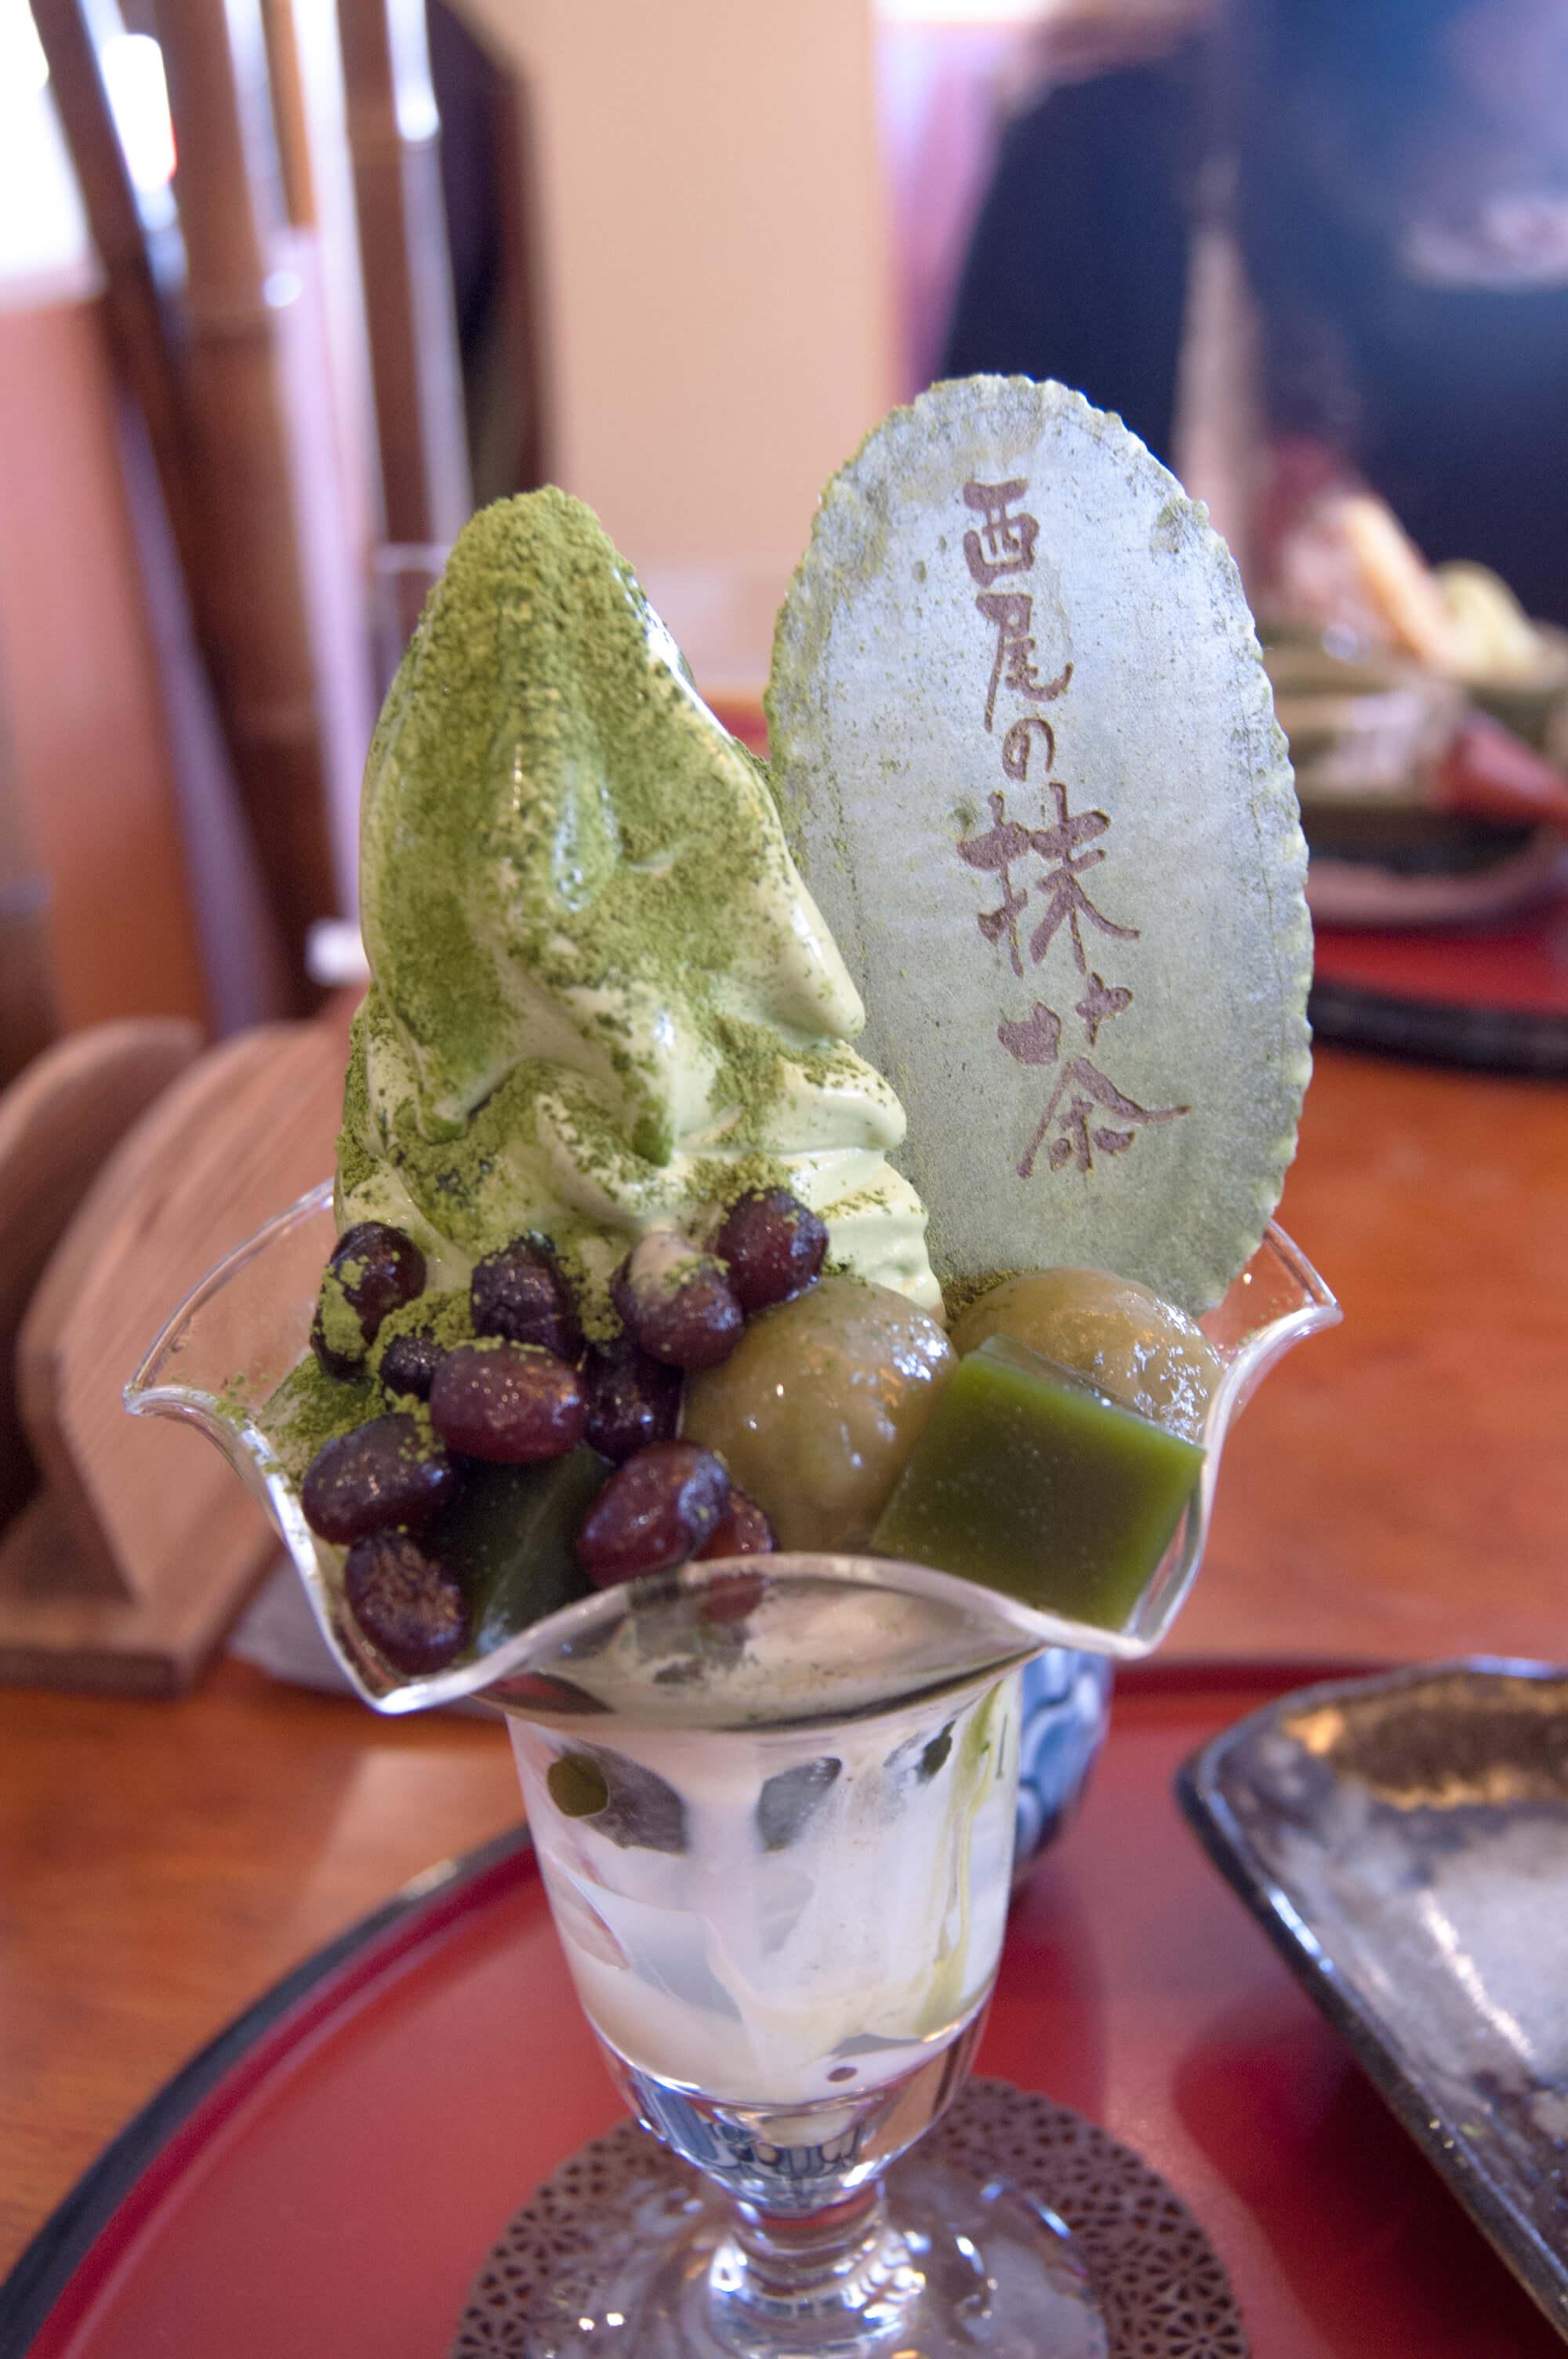 Matsutsuruen Nishio